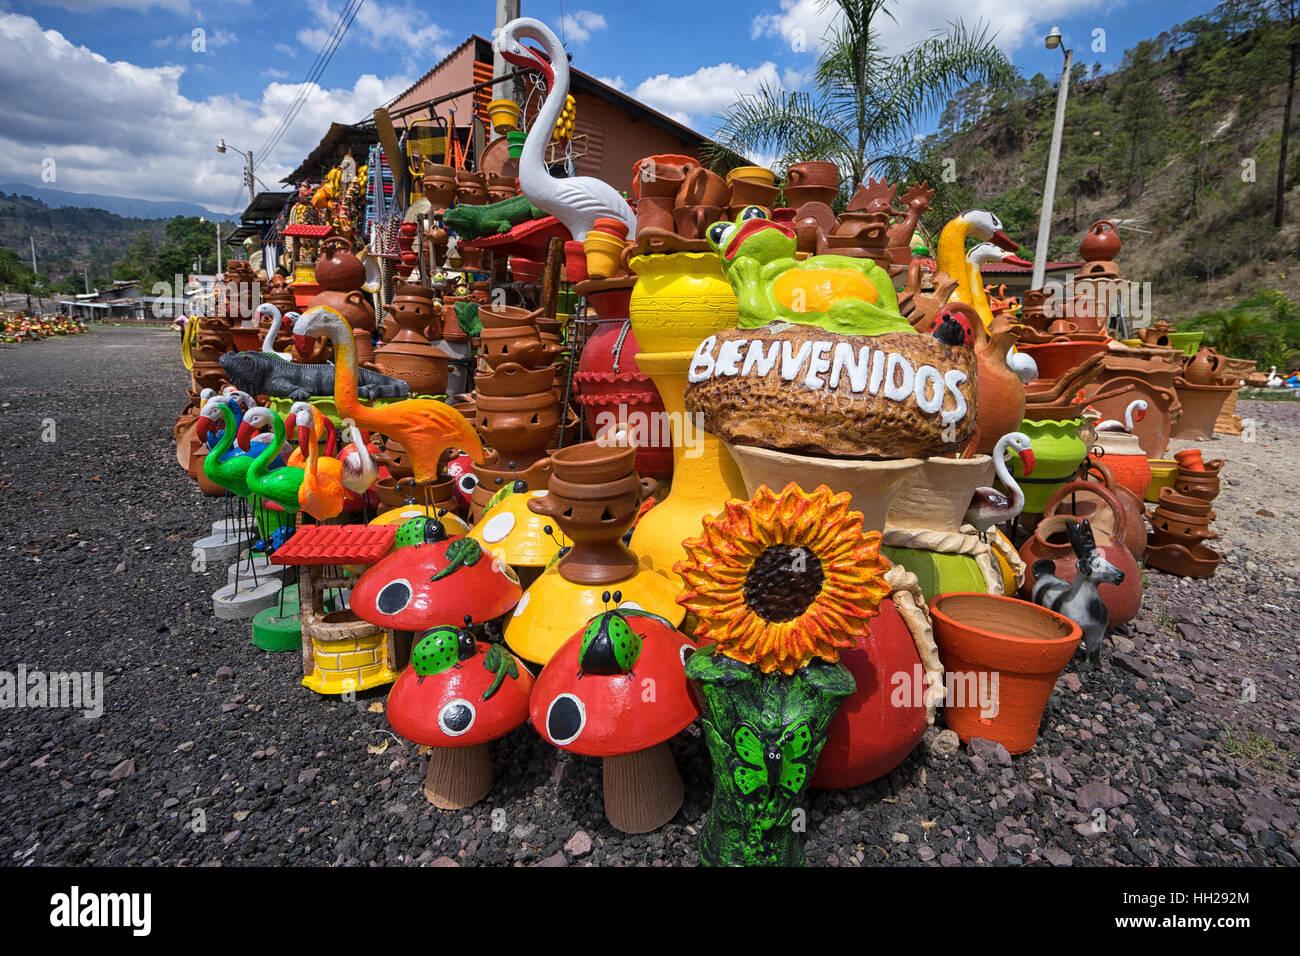 Roadside colorful artisan pottery in Honduras - Stock Image